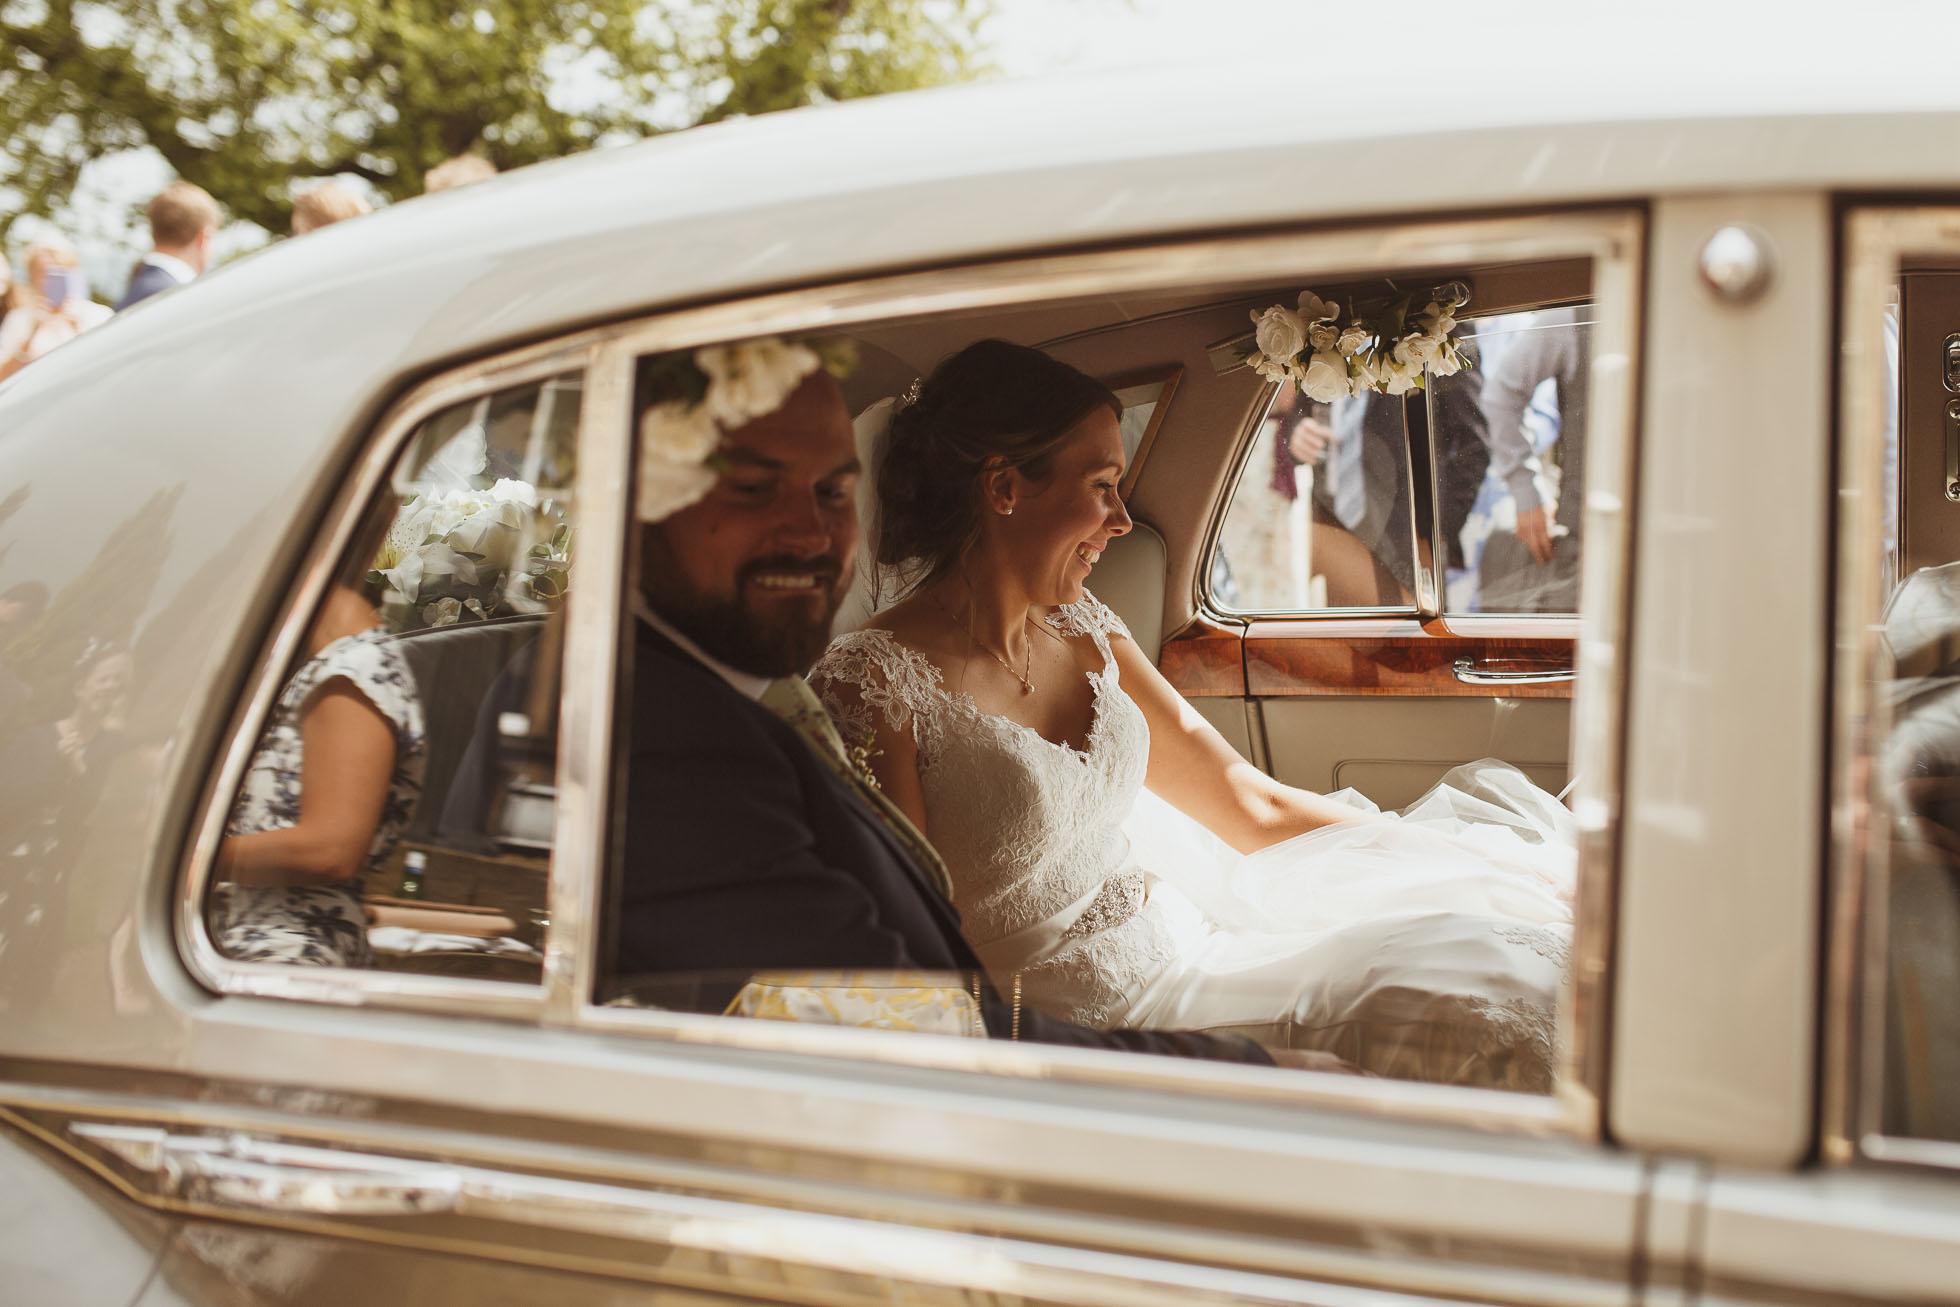 denton-hall-wedding-photographer-40.jpg